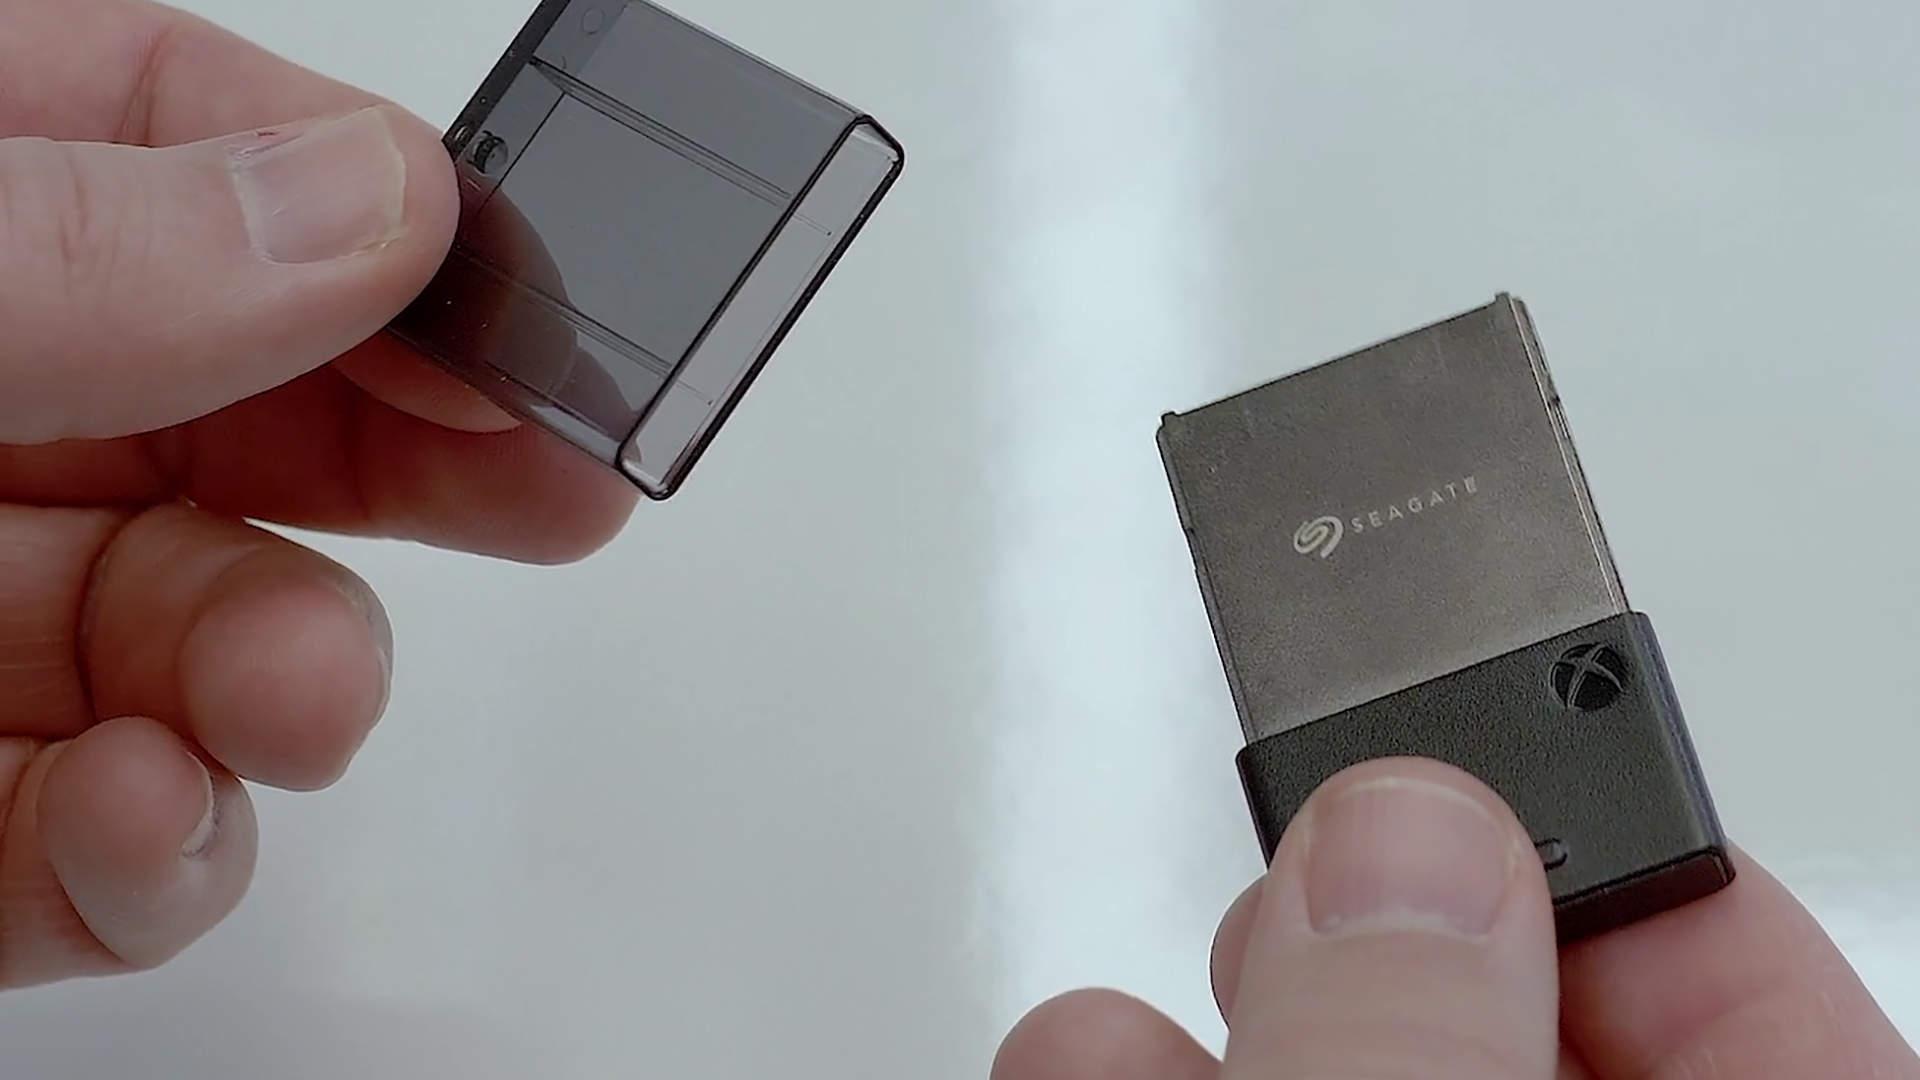 Игрокам на Xbox Series X будет доступно 802 Гб памяти, а на карте памяти 920 Гб